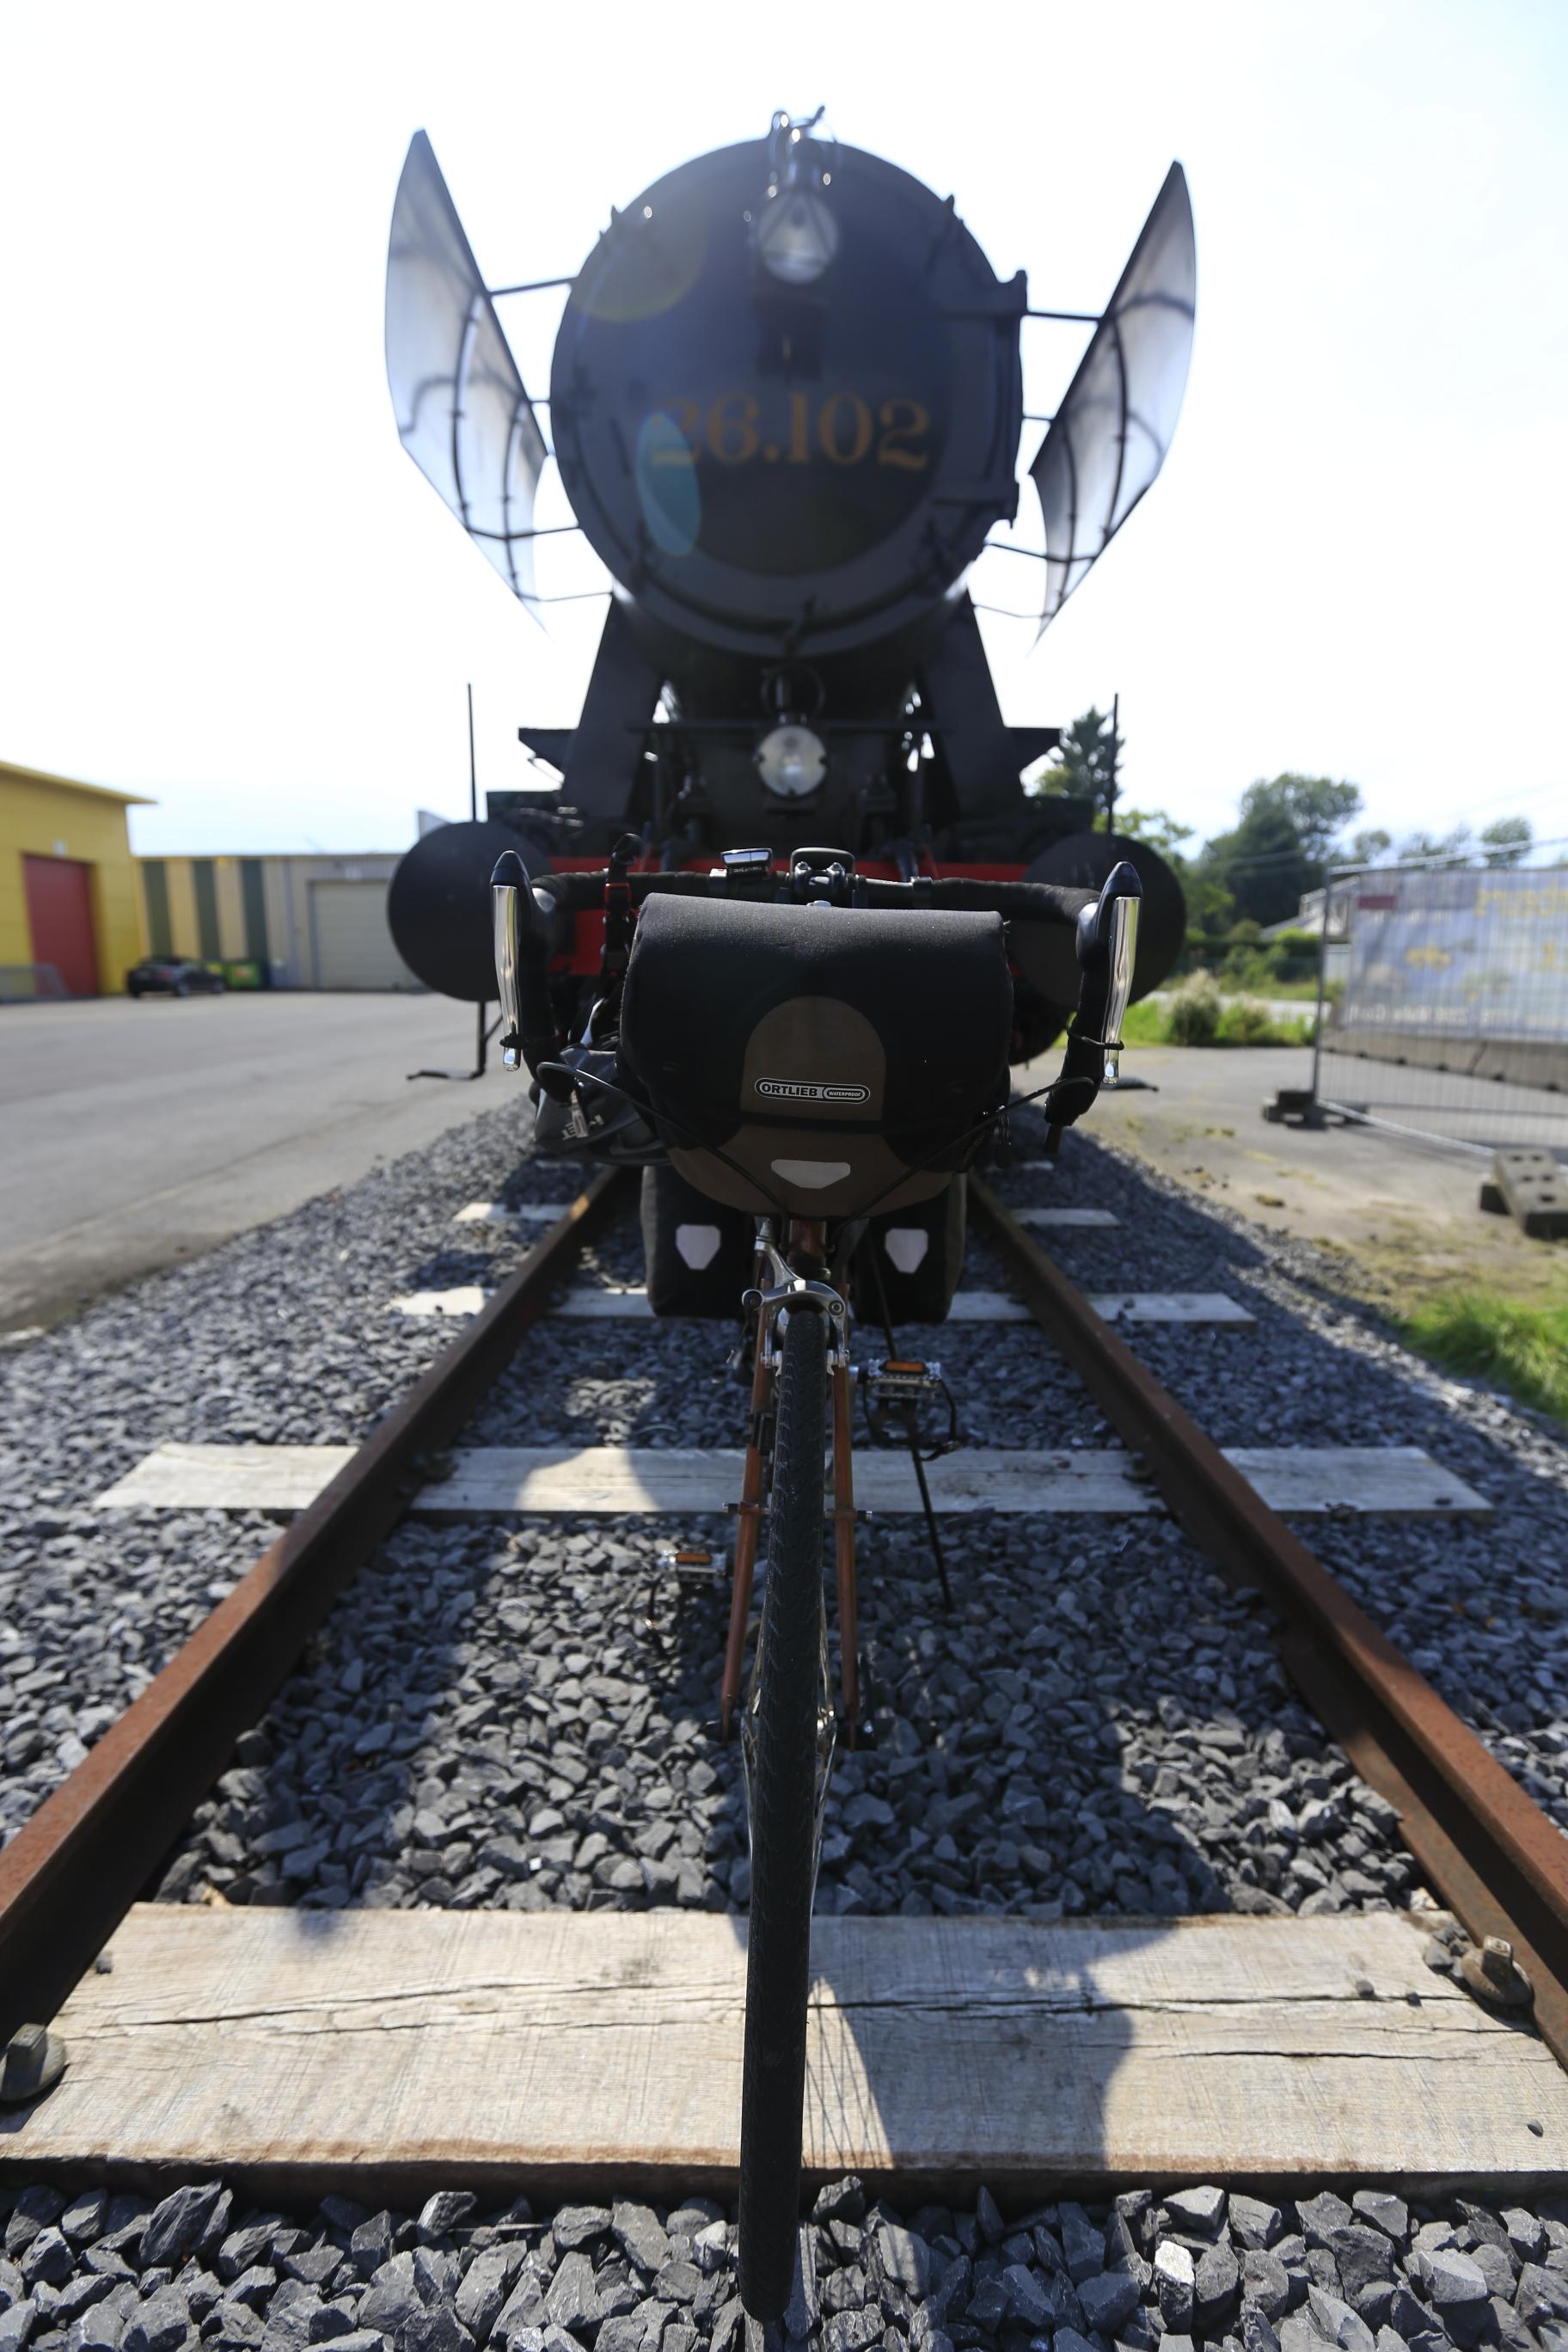 steam train train, locomotive, bicycle touring, bikepacking, canon 6d, bicycle, bikes, mountain bike, cycle gear, road bikes, road bike, raleigh bikes, bicycles, bike parts, mountain biking, bike accessories, racing bikes